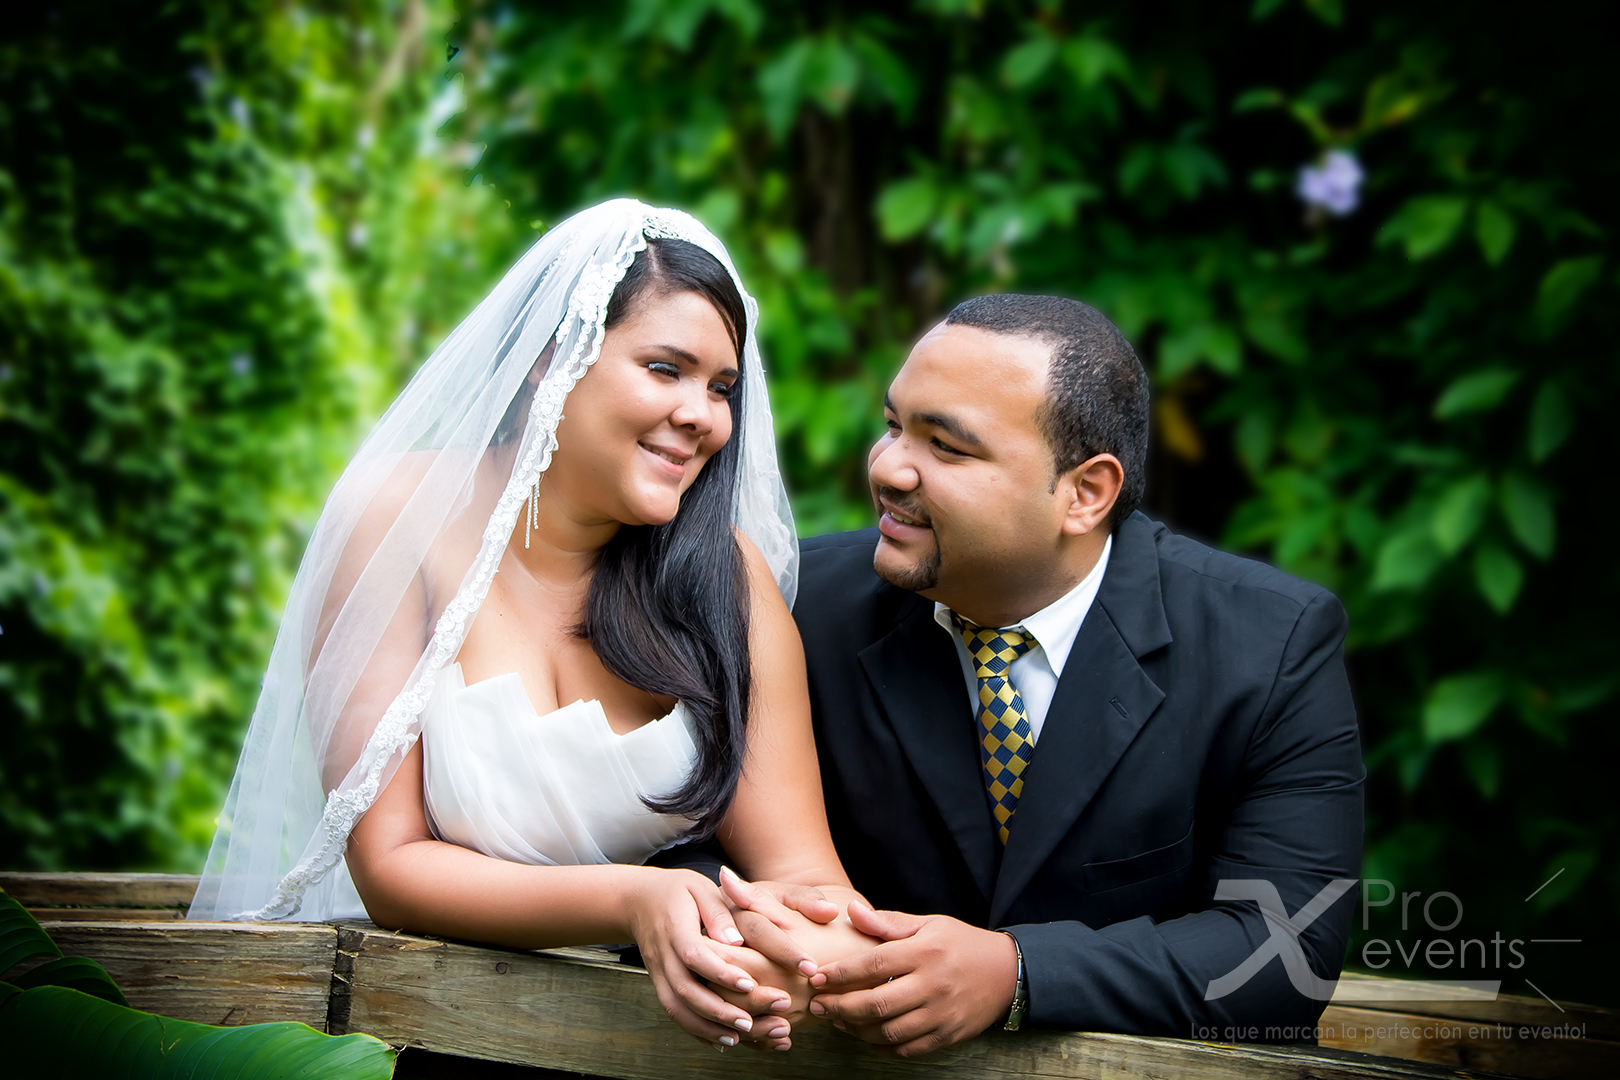 www.Xproevents.com - Novios Jonathan & Alexandra sonriendo.jpg